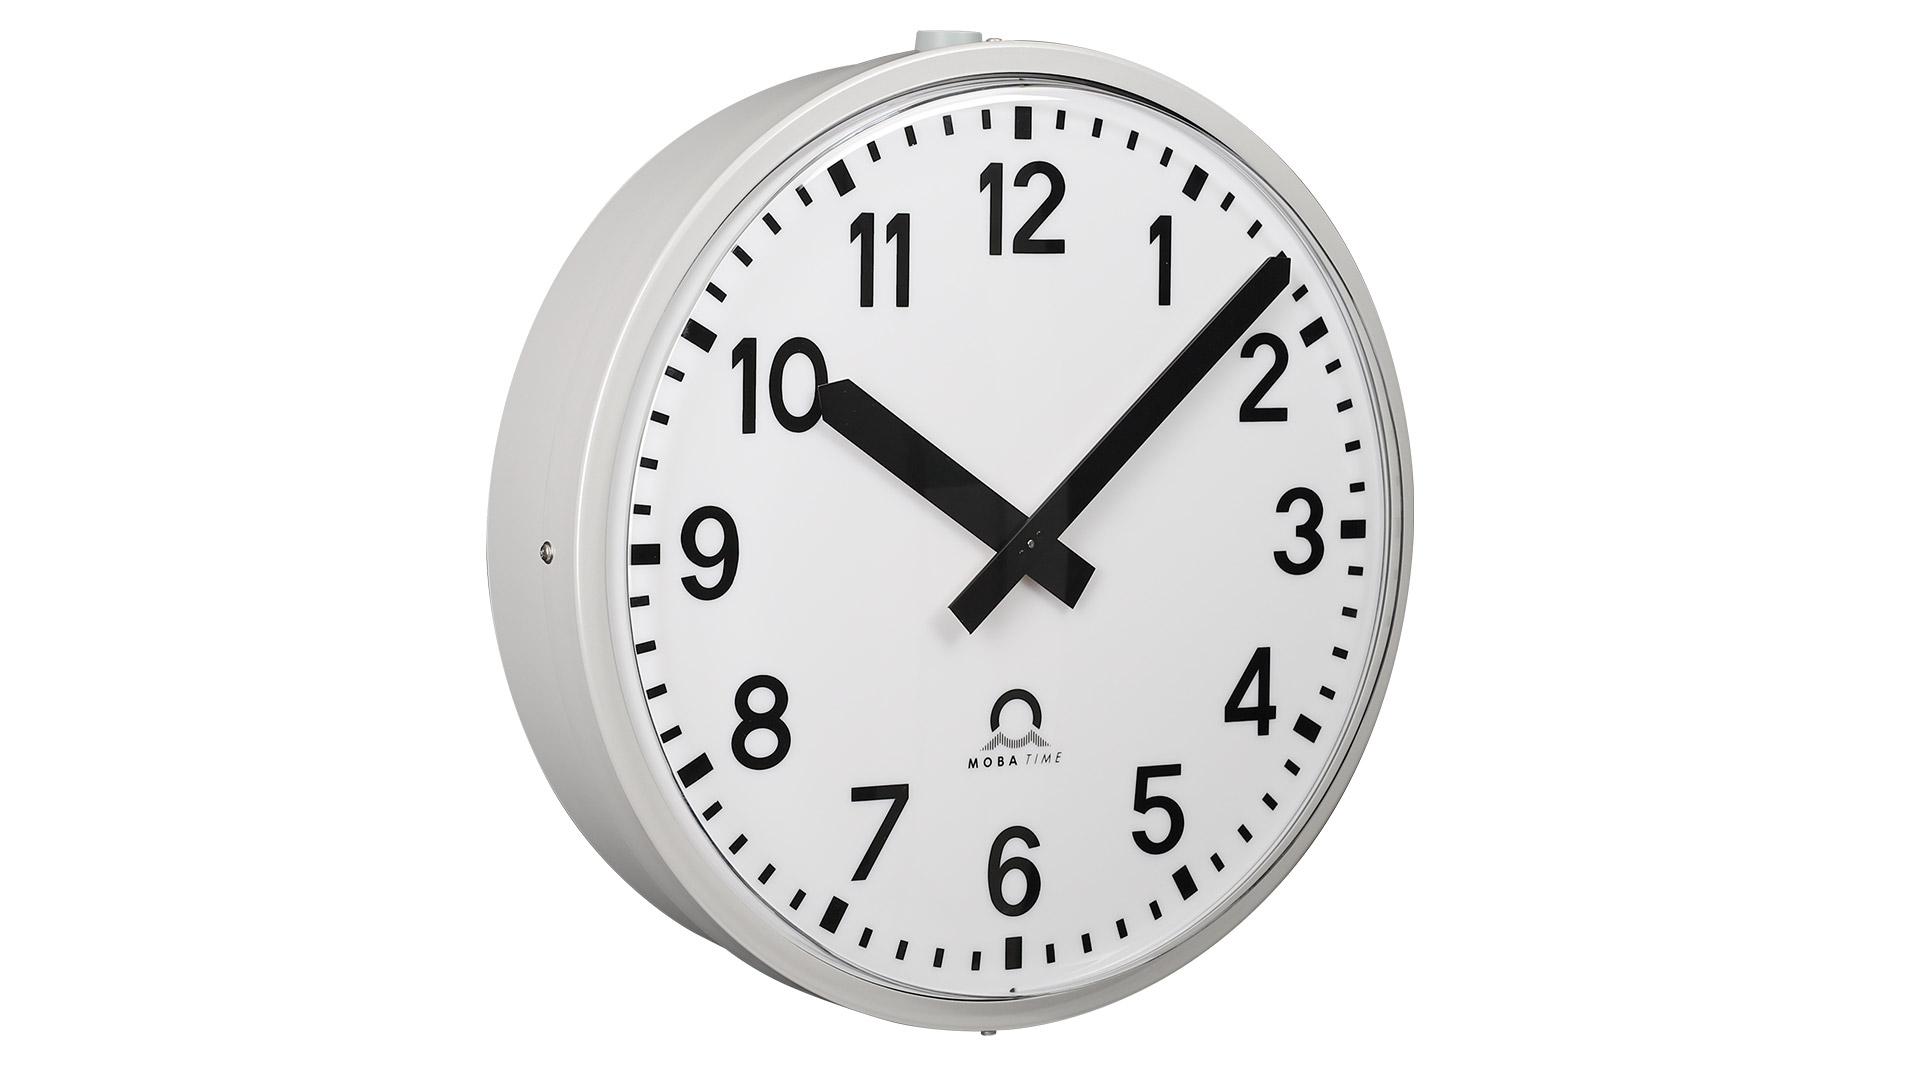 Mobatime metroline outdoor analogue clock, metallic case (Aluminum) side view